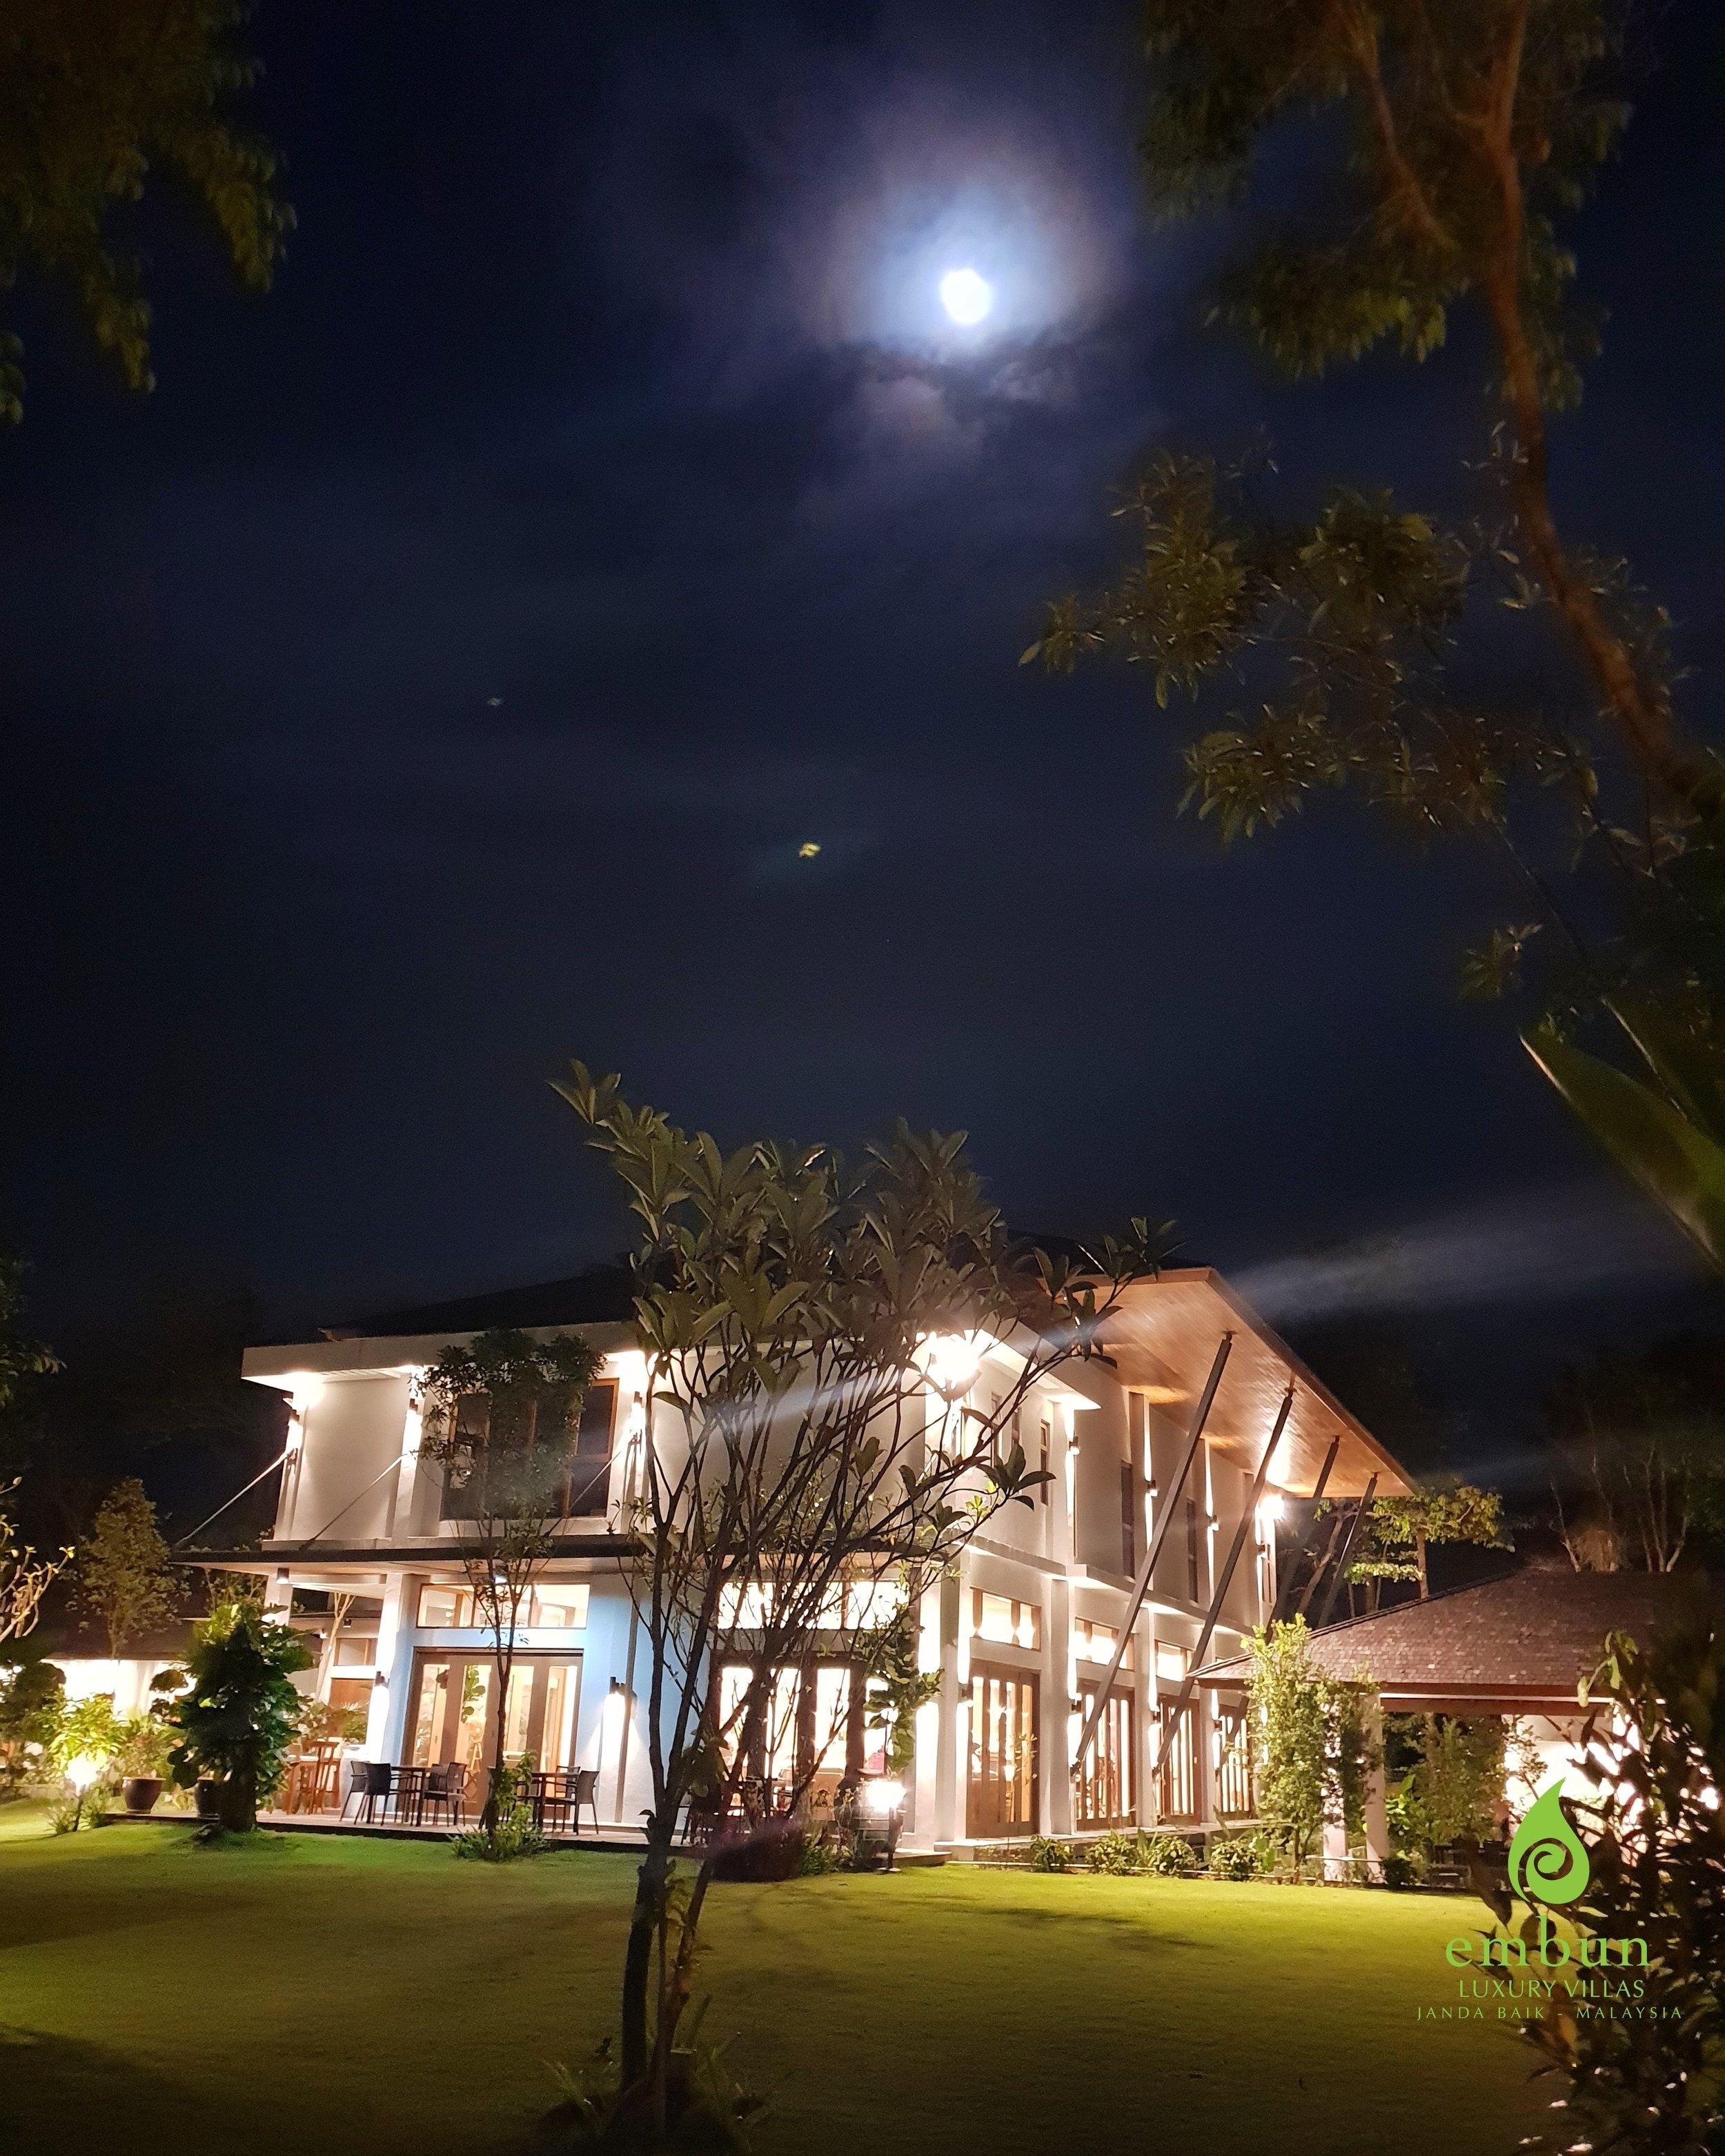 C;ubhouse at night.jpg